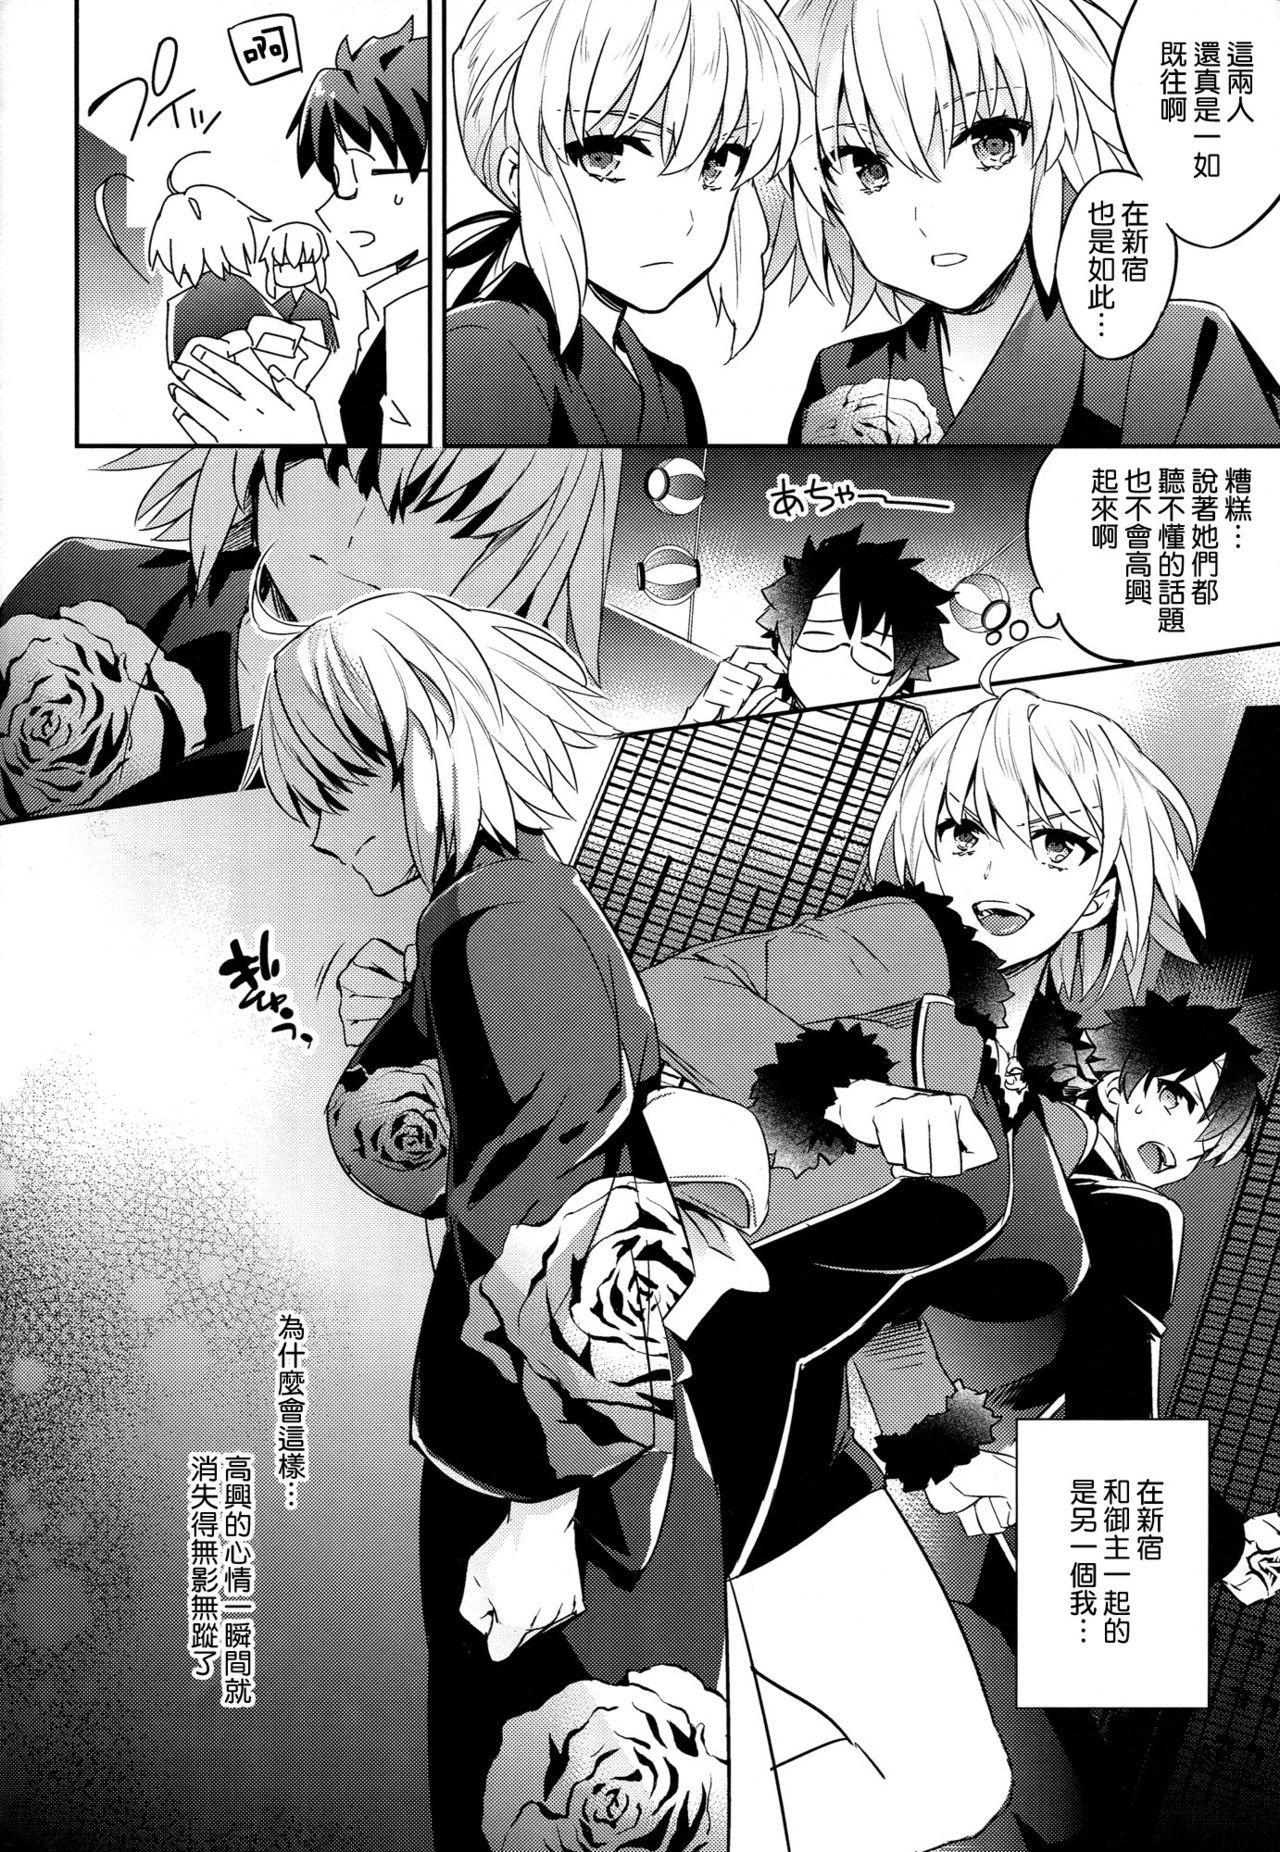 (C92) [Crazy9 (Ichitaka)] C9-30 Jeanne Alter-chan to Natsumatsuri (Fate/Grand Order) [Chinese] [空気系☆漢化] 8